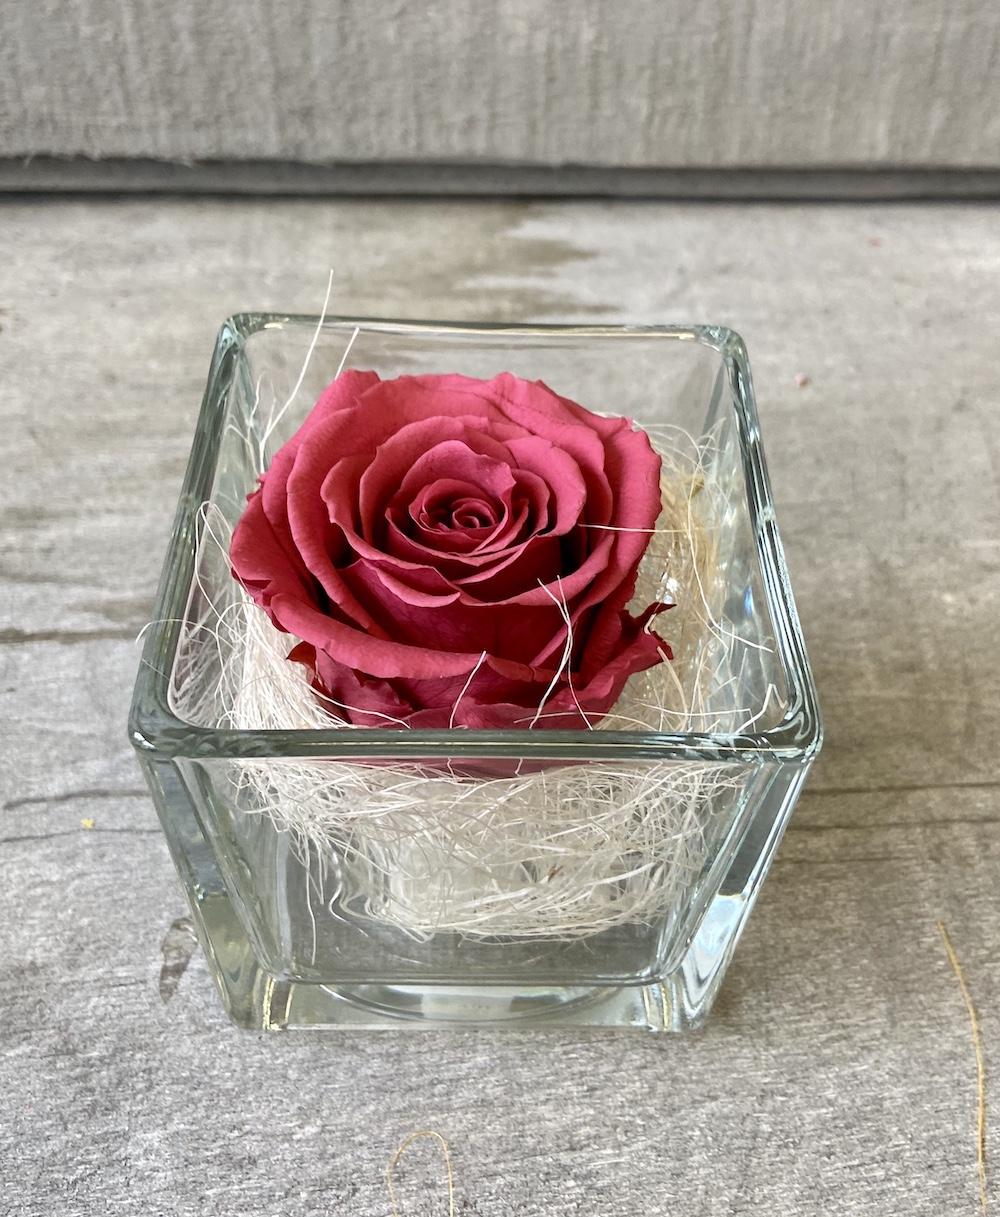 flower box rose stabilizzate cranberry florashopping Rossana flower store NovellinoIMG_0676